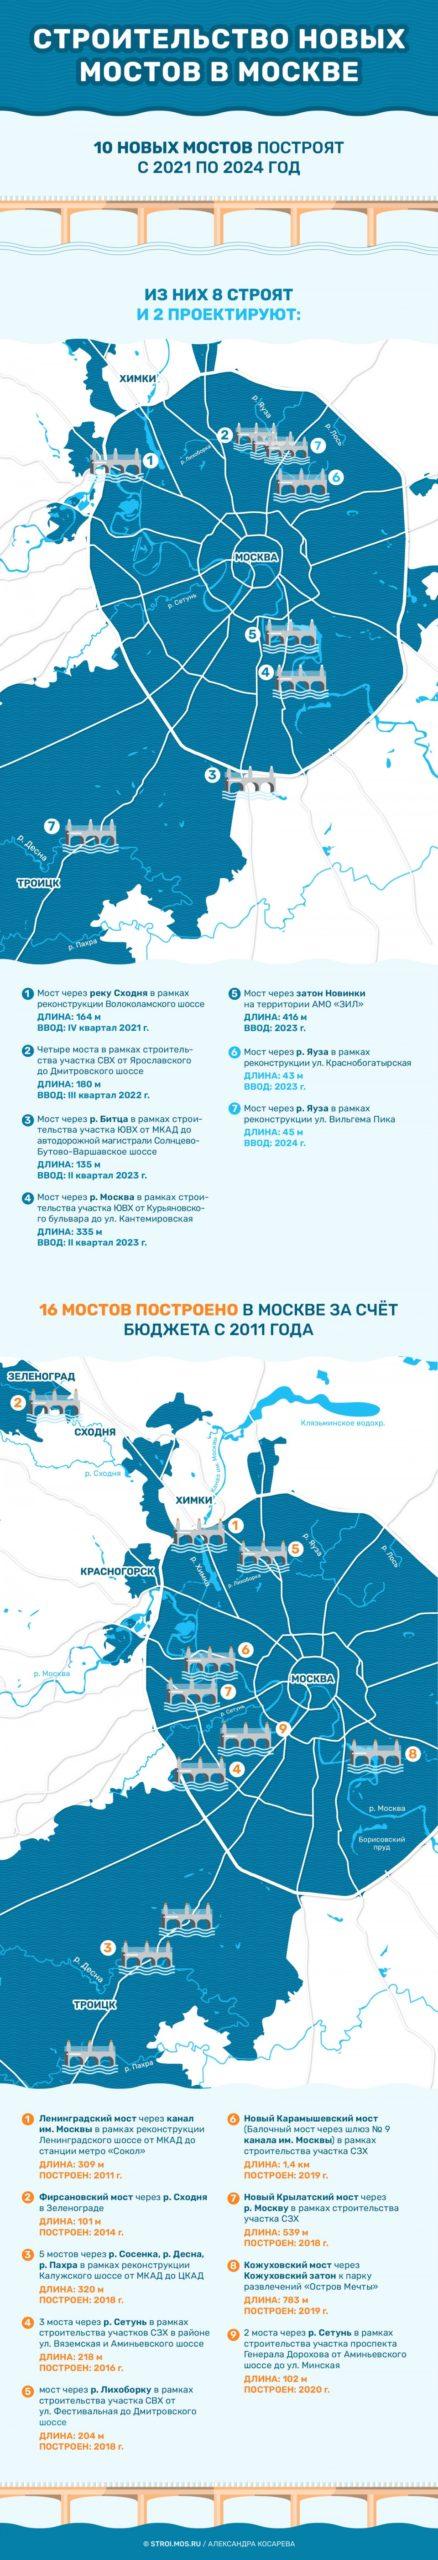 Через Москву-реку построят 12 мостов